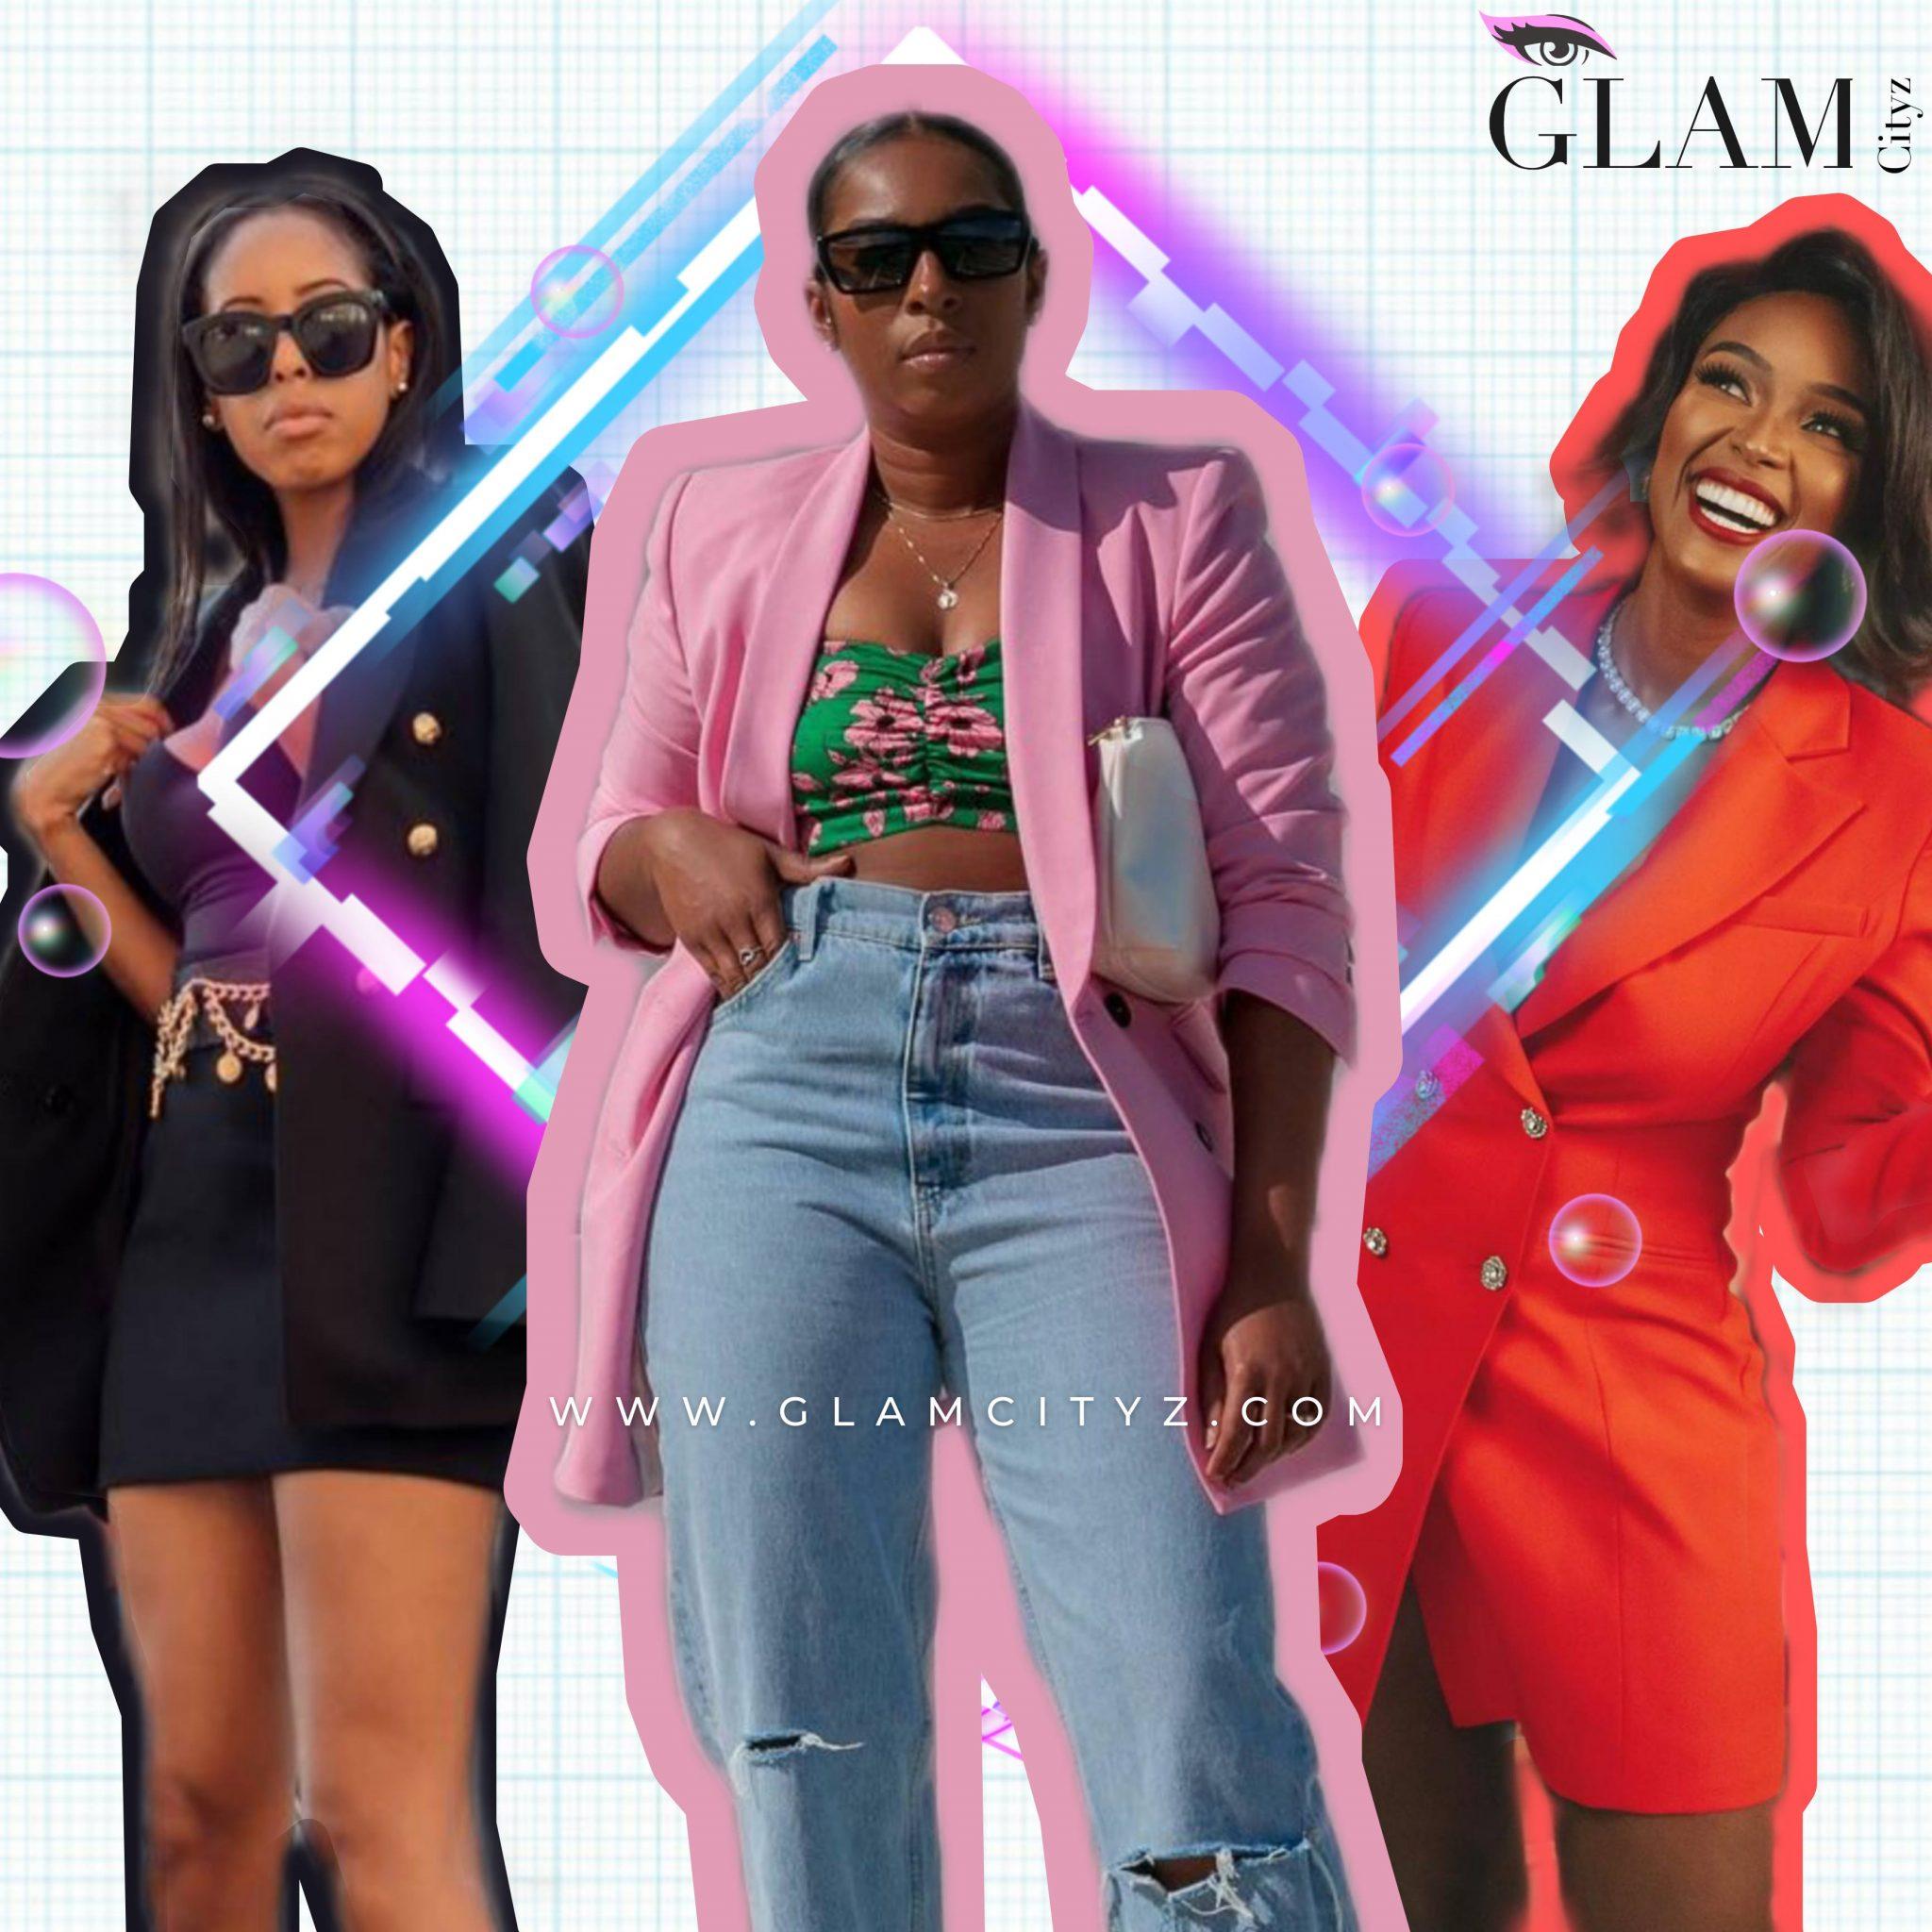 Glamcityz.comBlazerInspo scaled